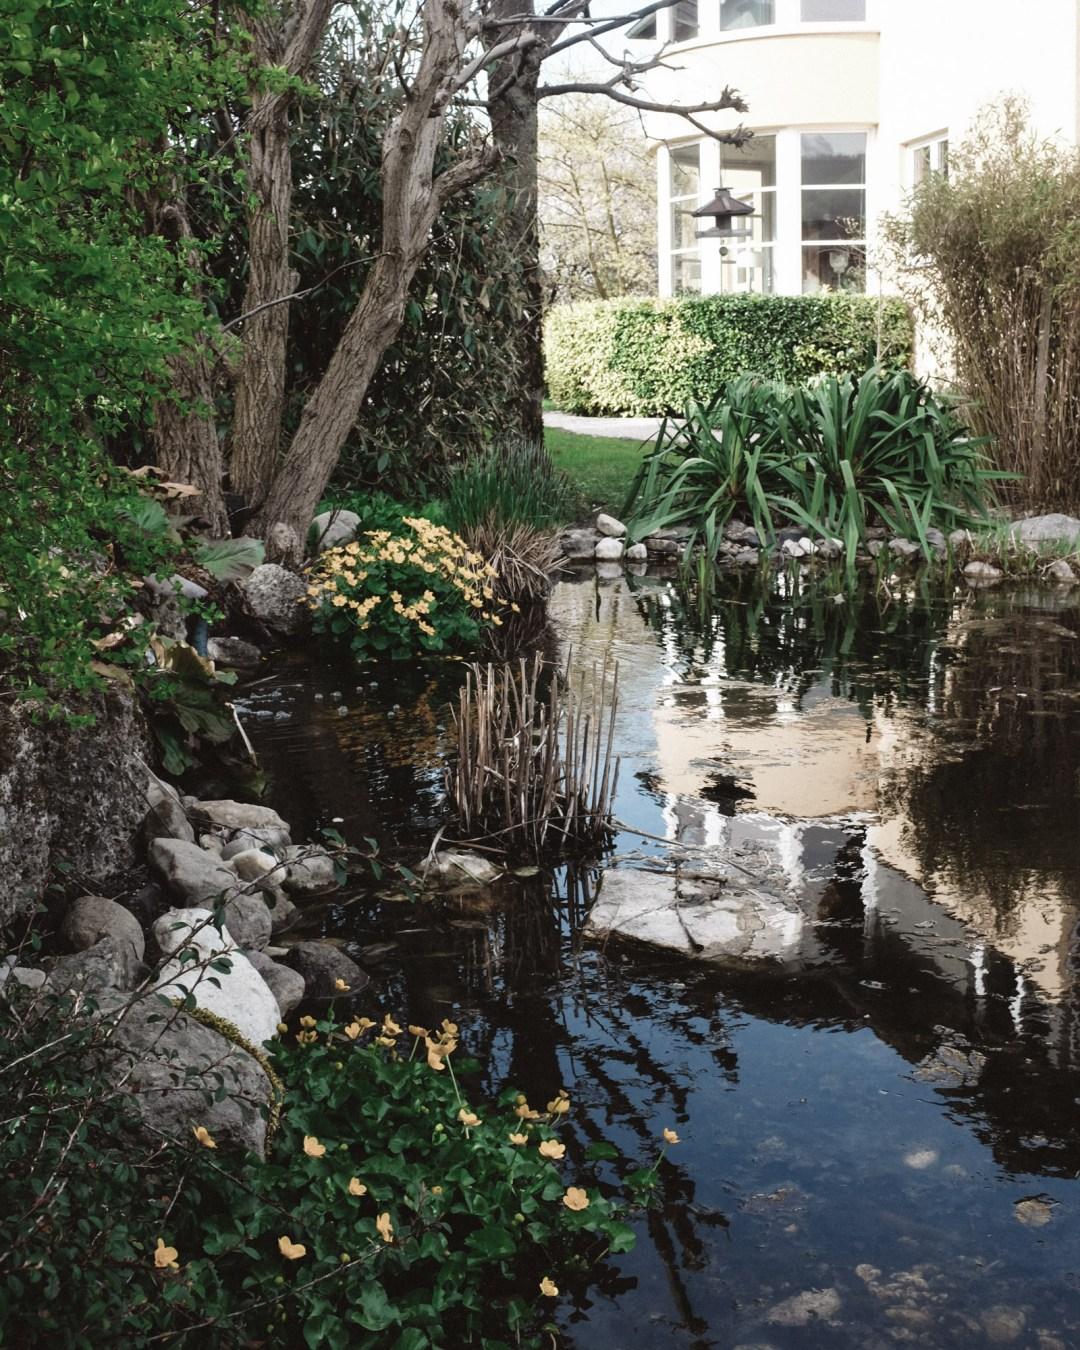 inastil, Frühlingsgarten, Teich, Magnolien, Frühlingsblüher, Lachs, Spargelrezept, Mangosalsa, Lowcarb, leichtes Abendessen, Ü50Blogger-4